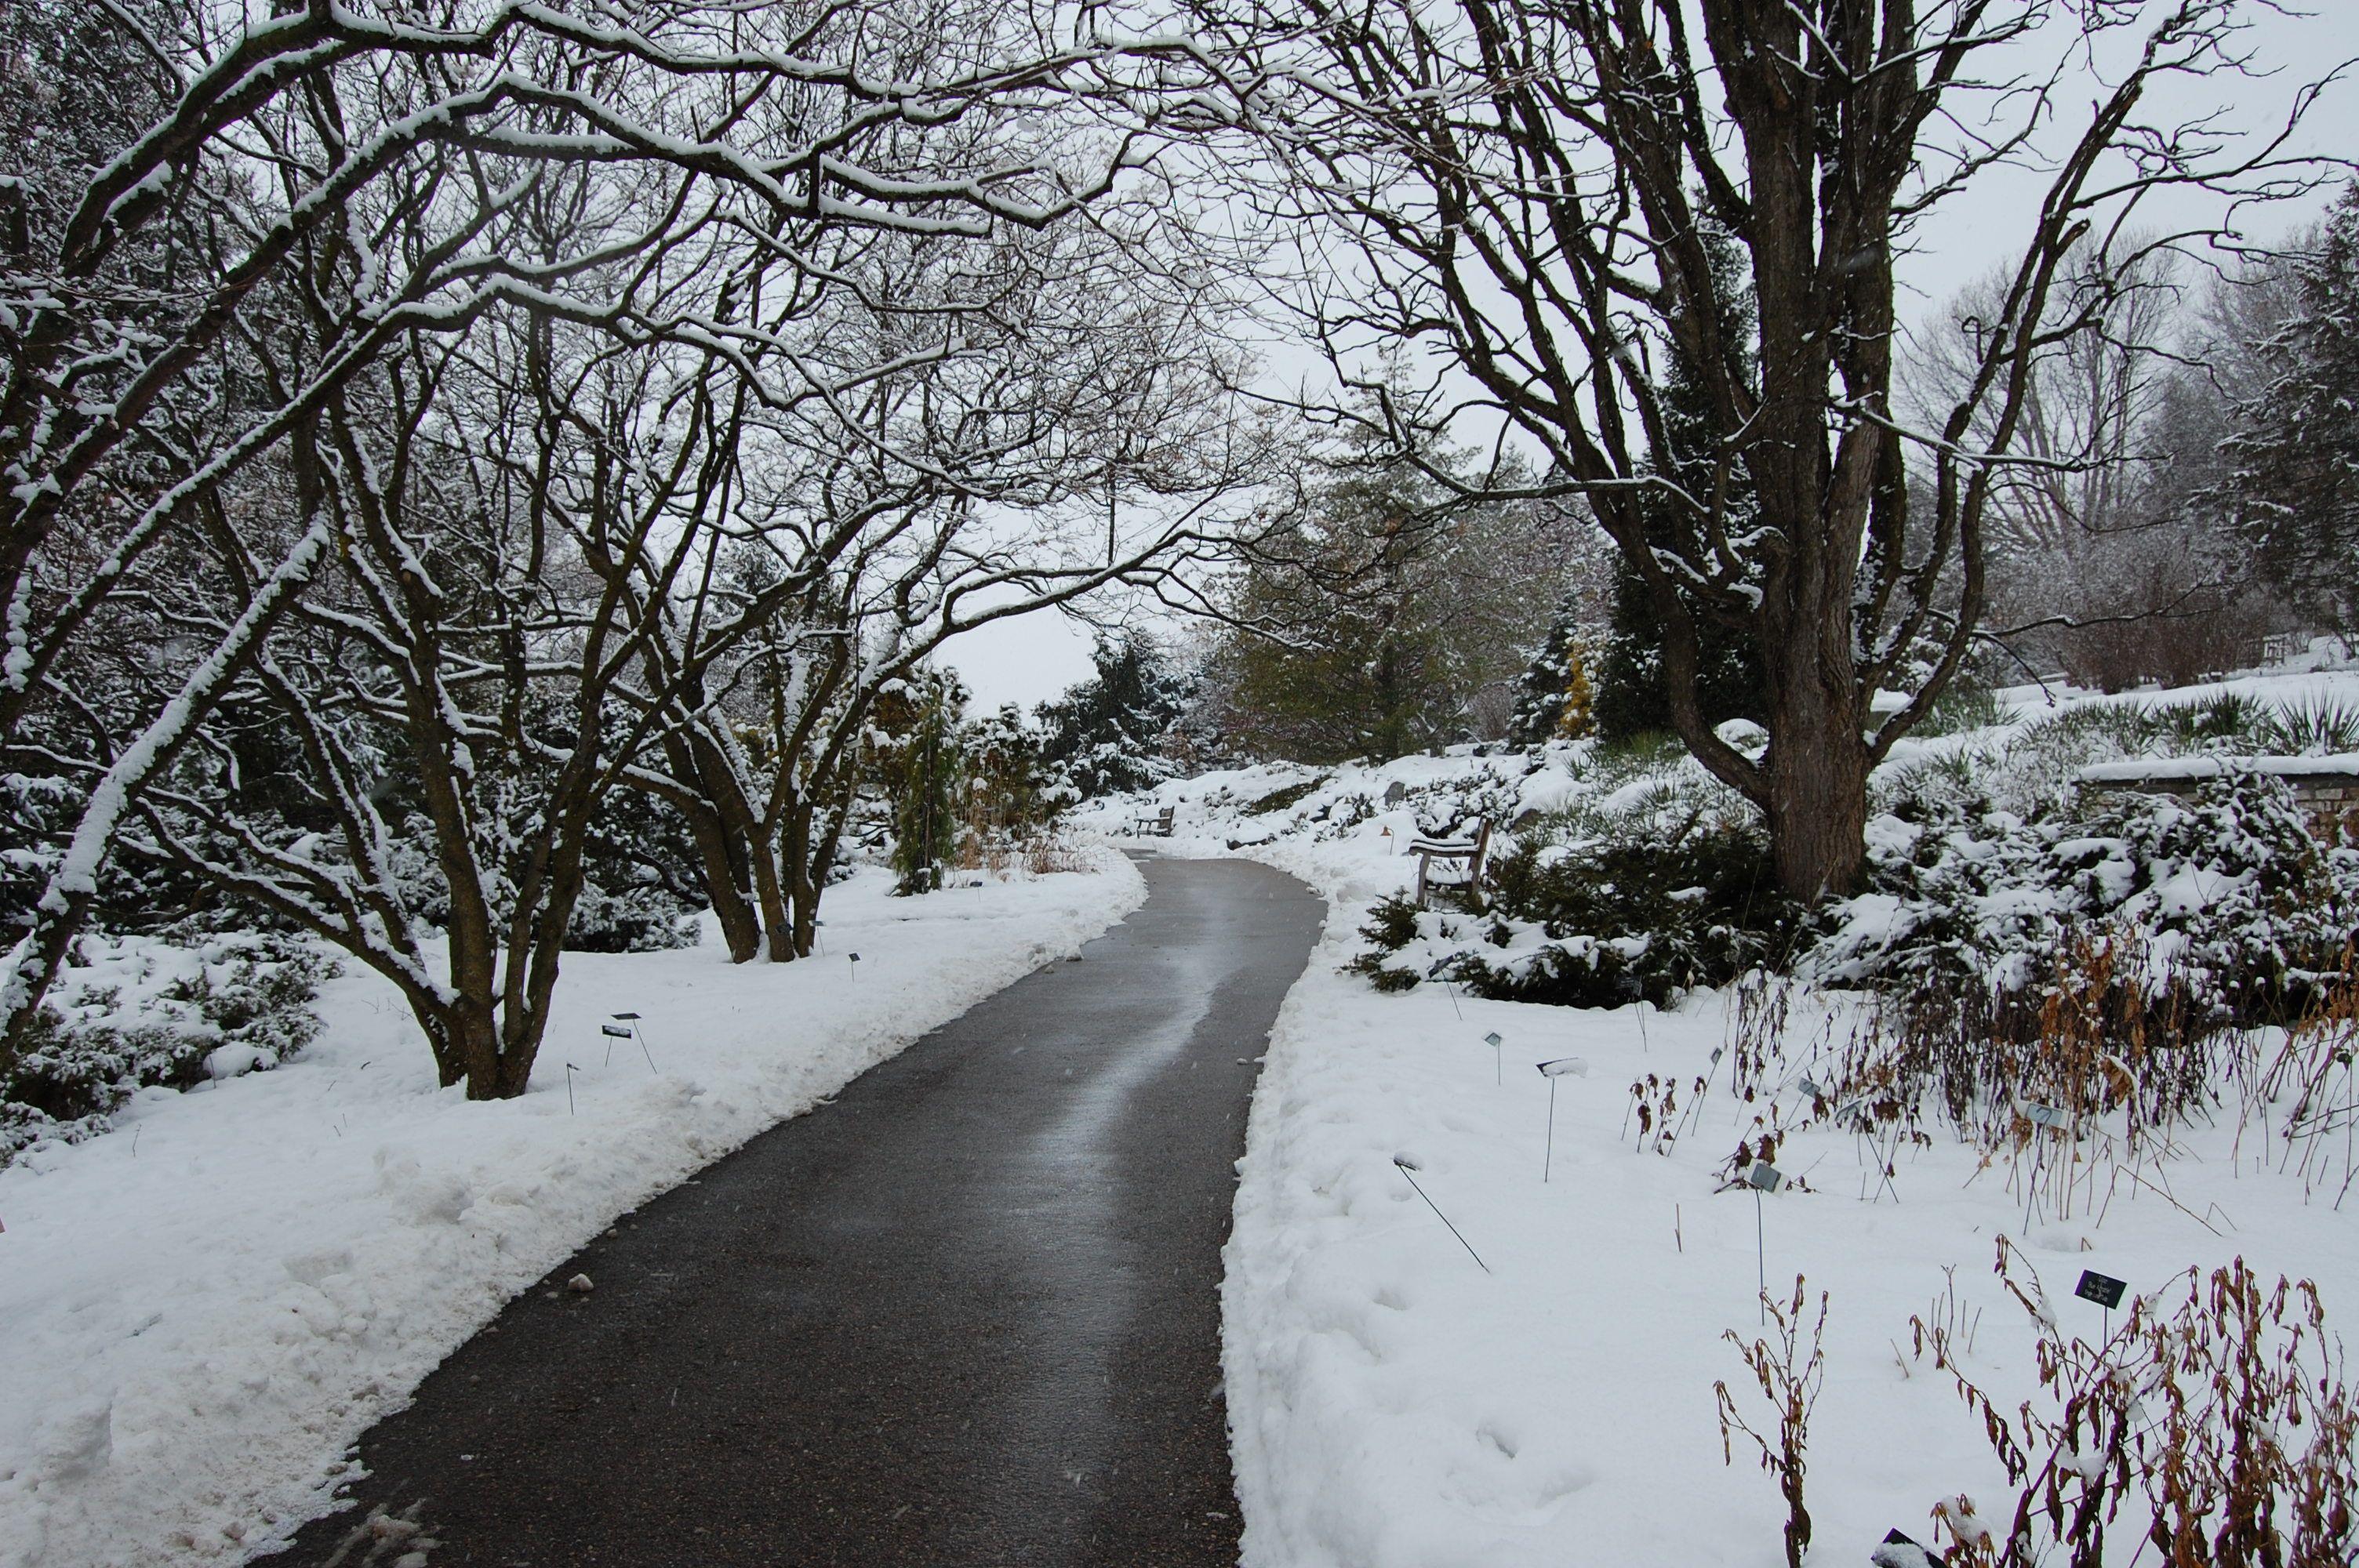 a winter wonderland here at the minnesota landscape arboretum